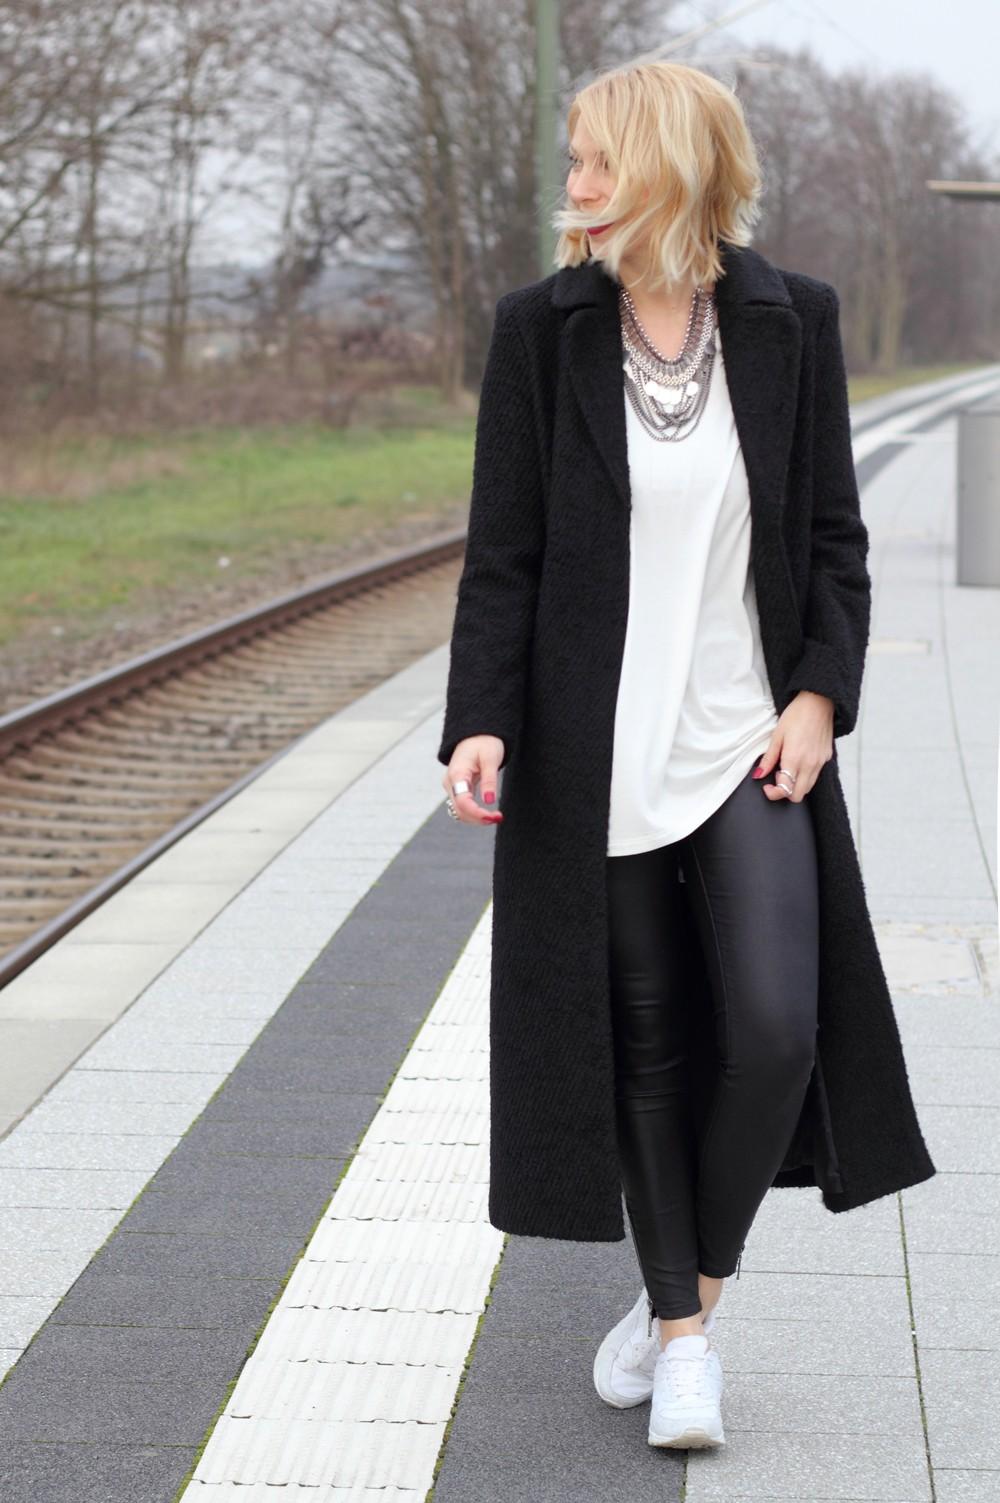 Fashionbloggerin Karlsruhe Outfit Lederhosen Sneaker Sweater langer Mantel 12